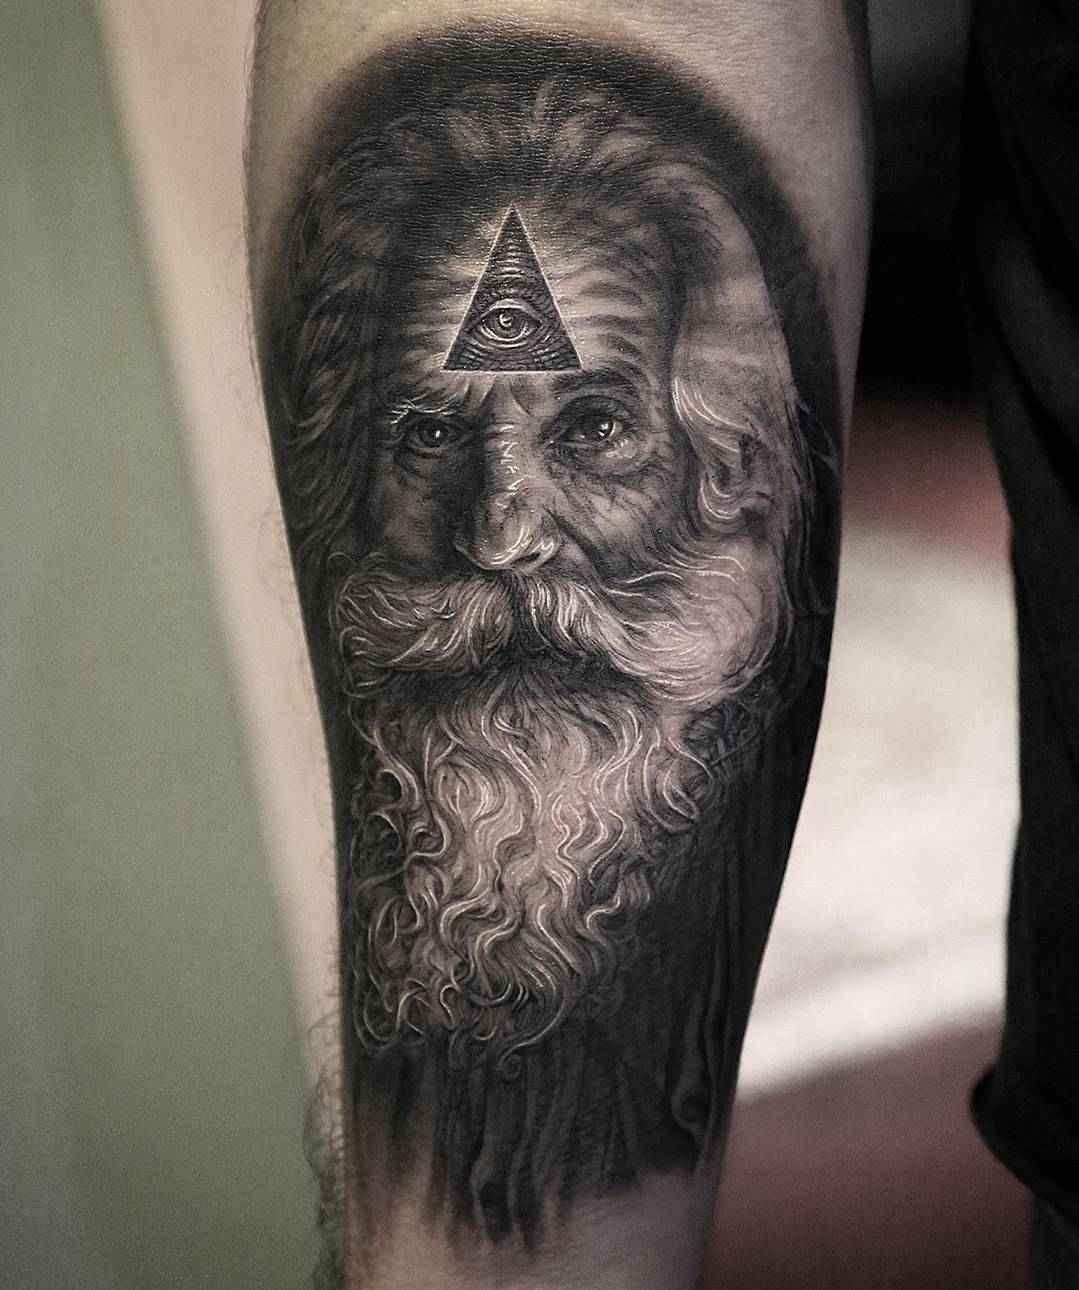 Stefano alcantara tattoo realism from peru inkppl for Tattoo artist in fort lauderdale